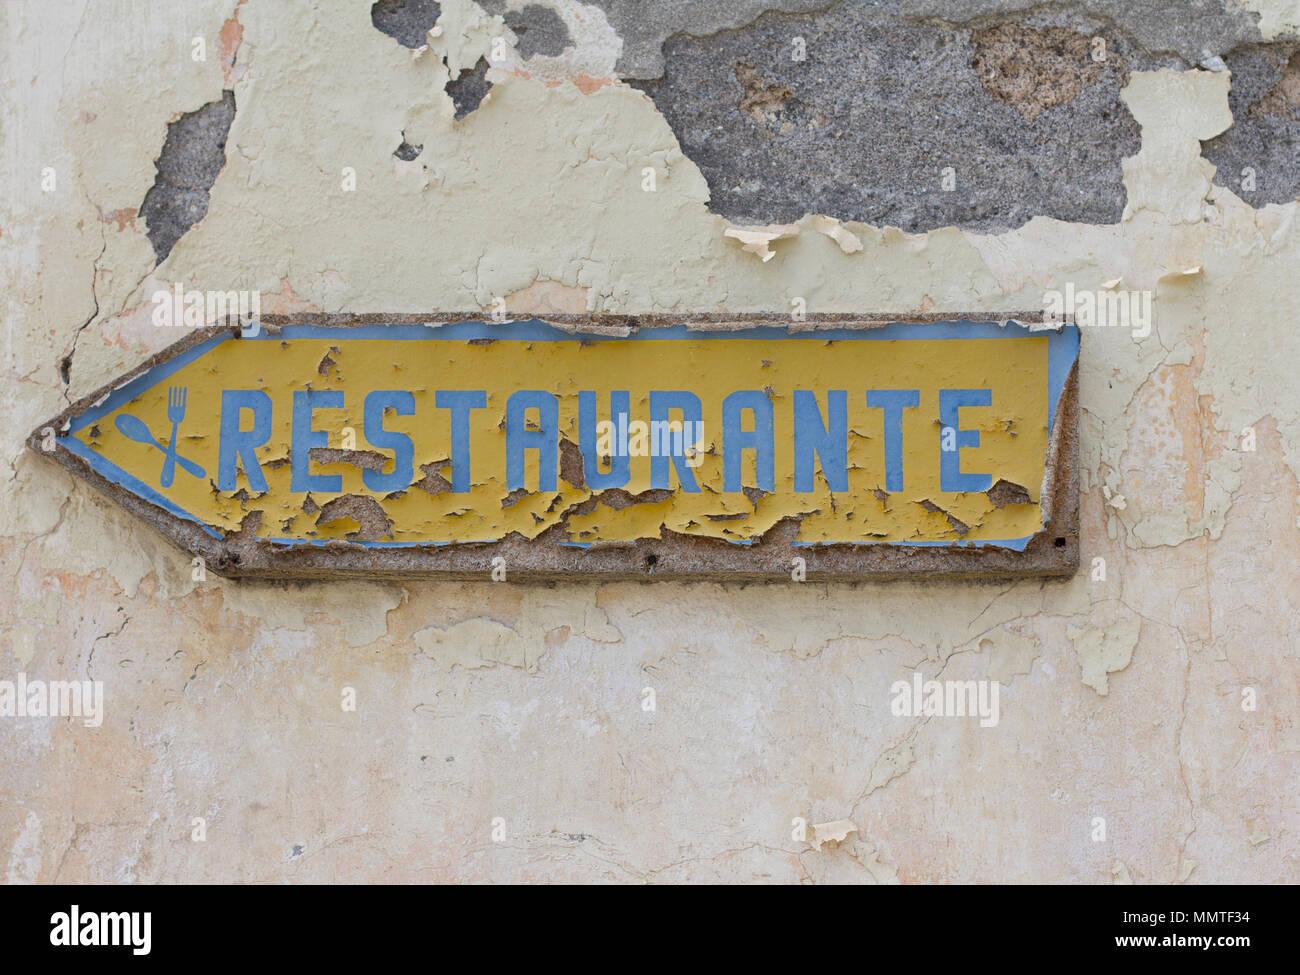 Restaurant sign in portuguese language Stock Photo